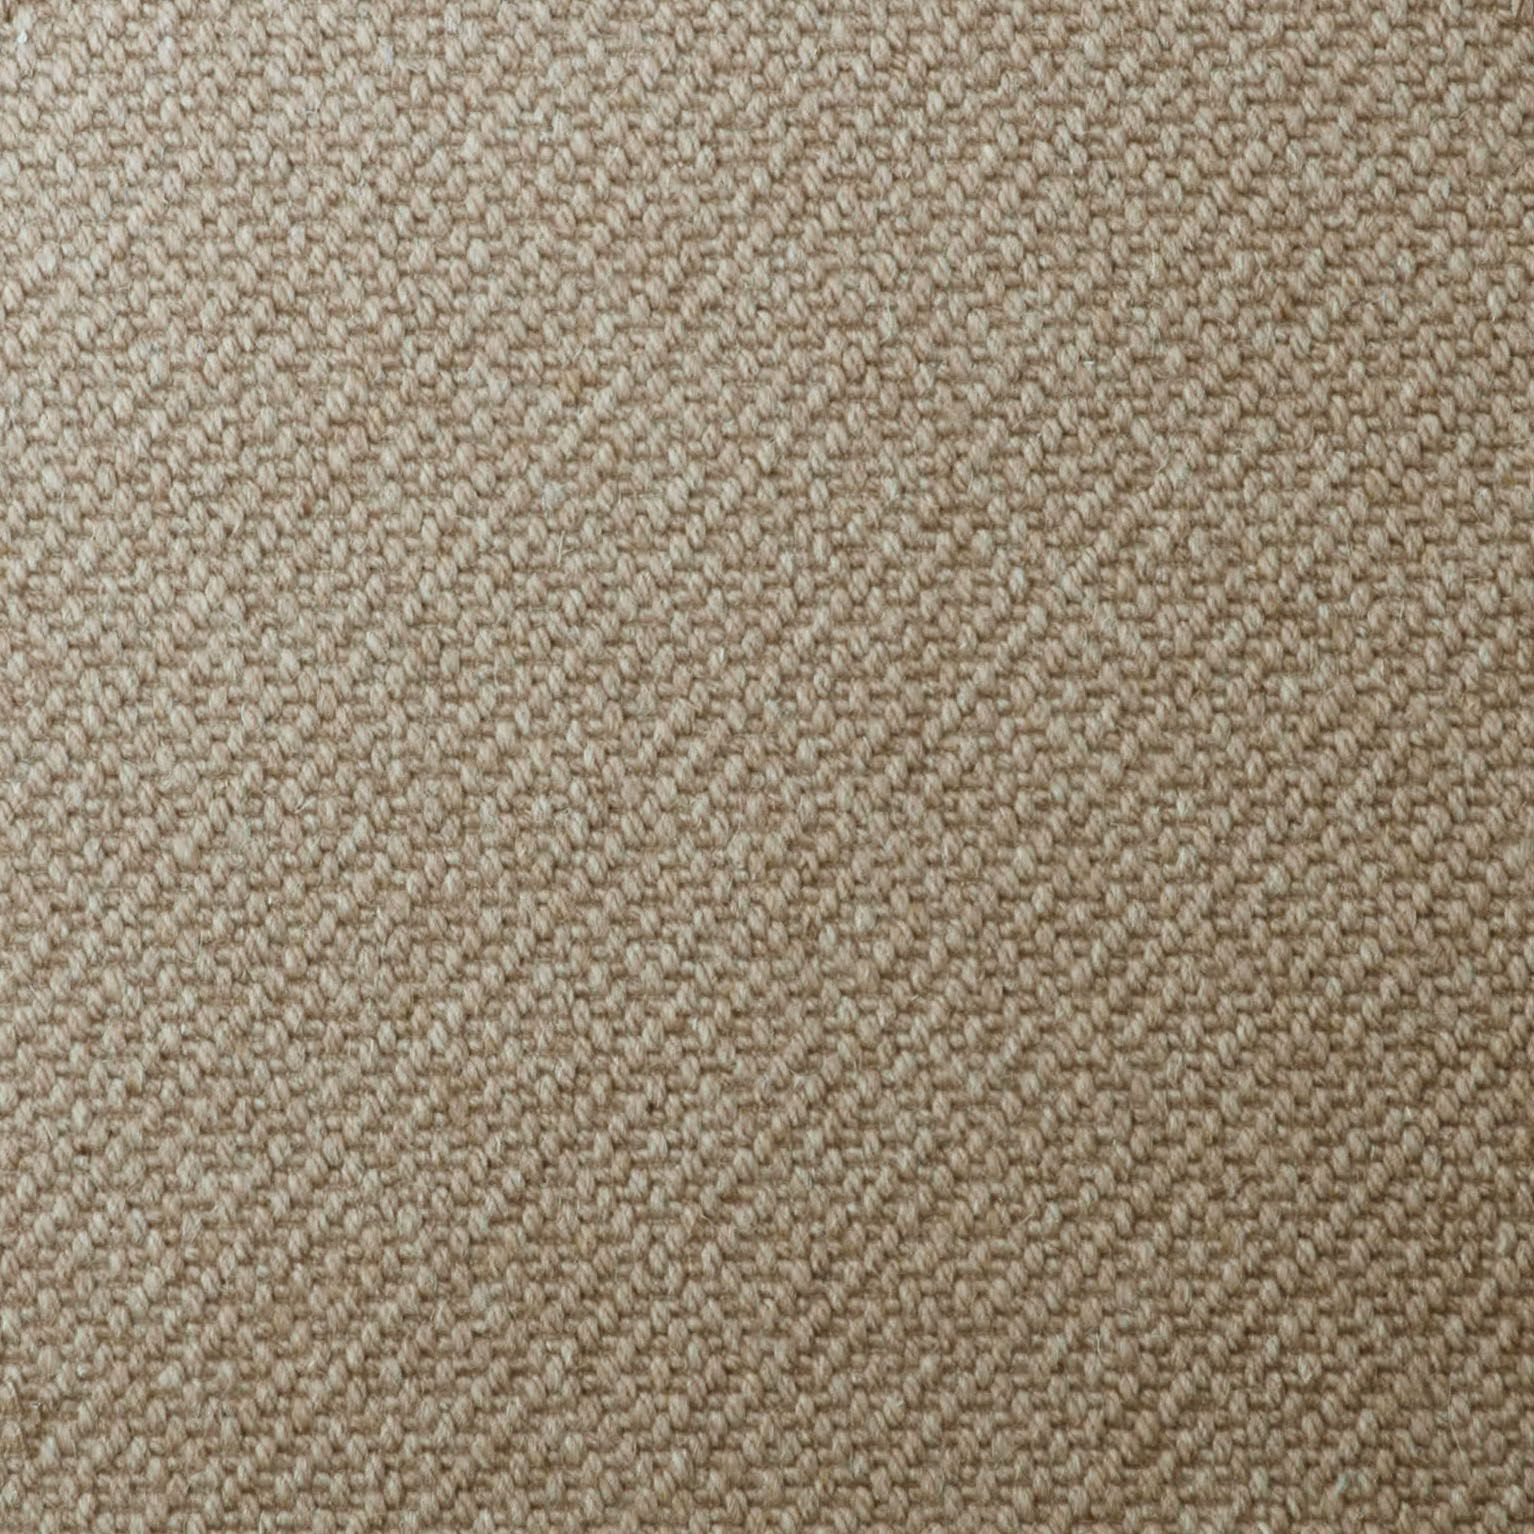 Design Your Rug Fibreworkscasselbarry Rugs Floor Rugs Design